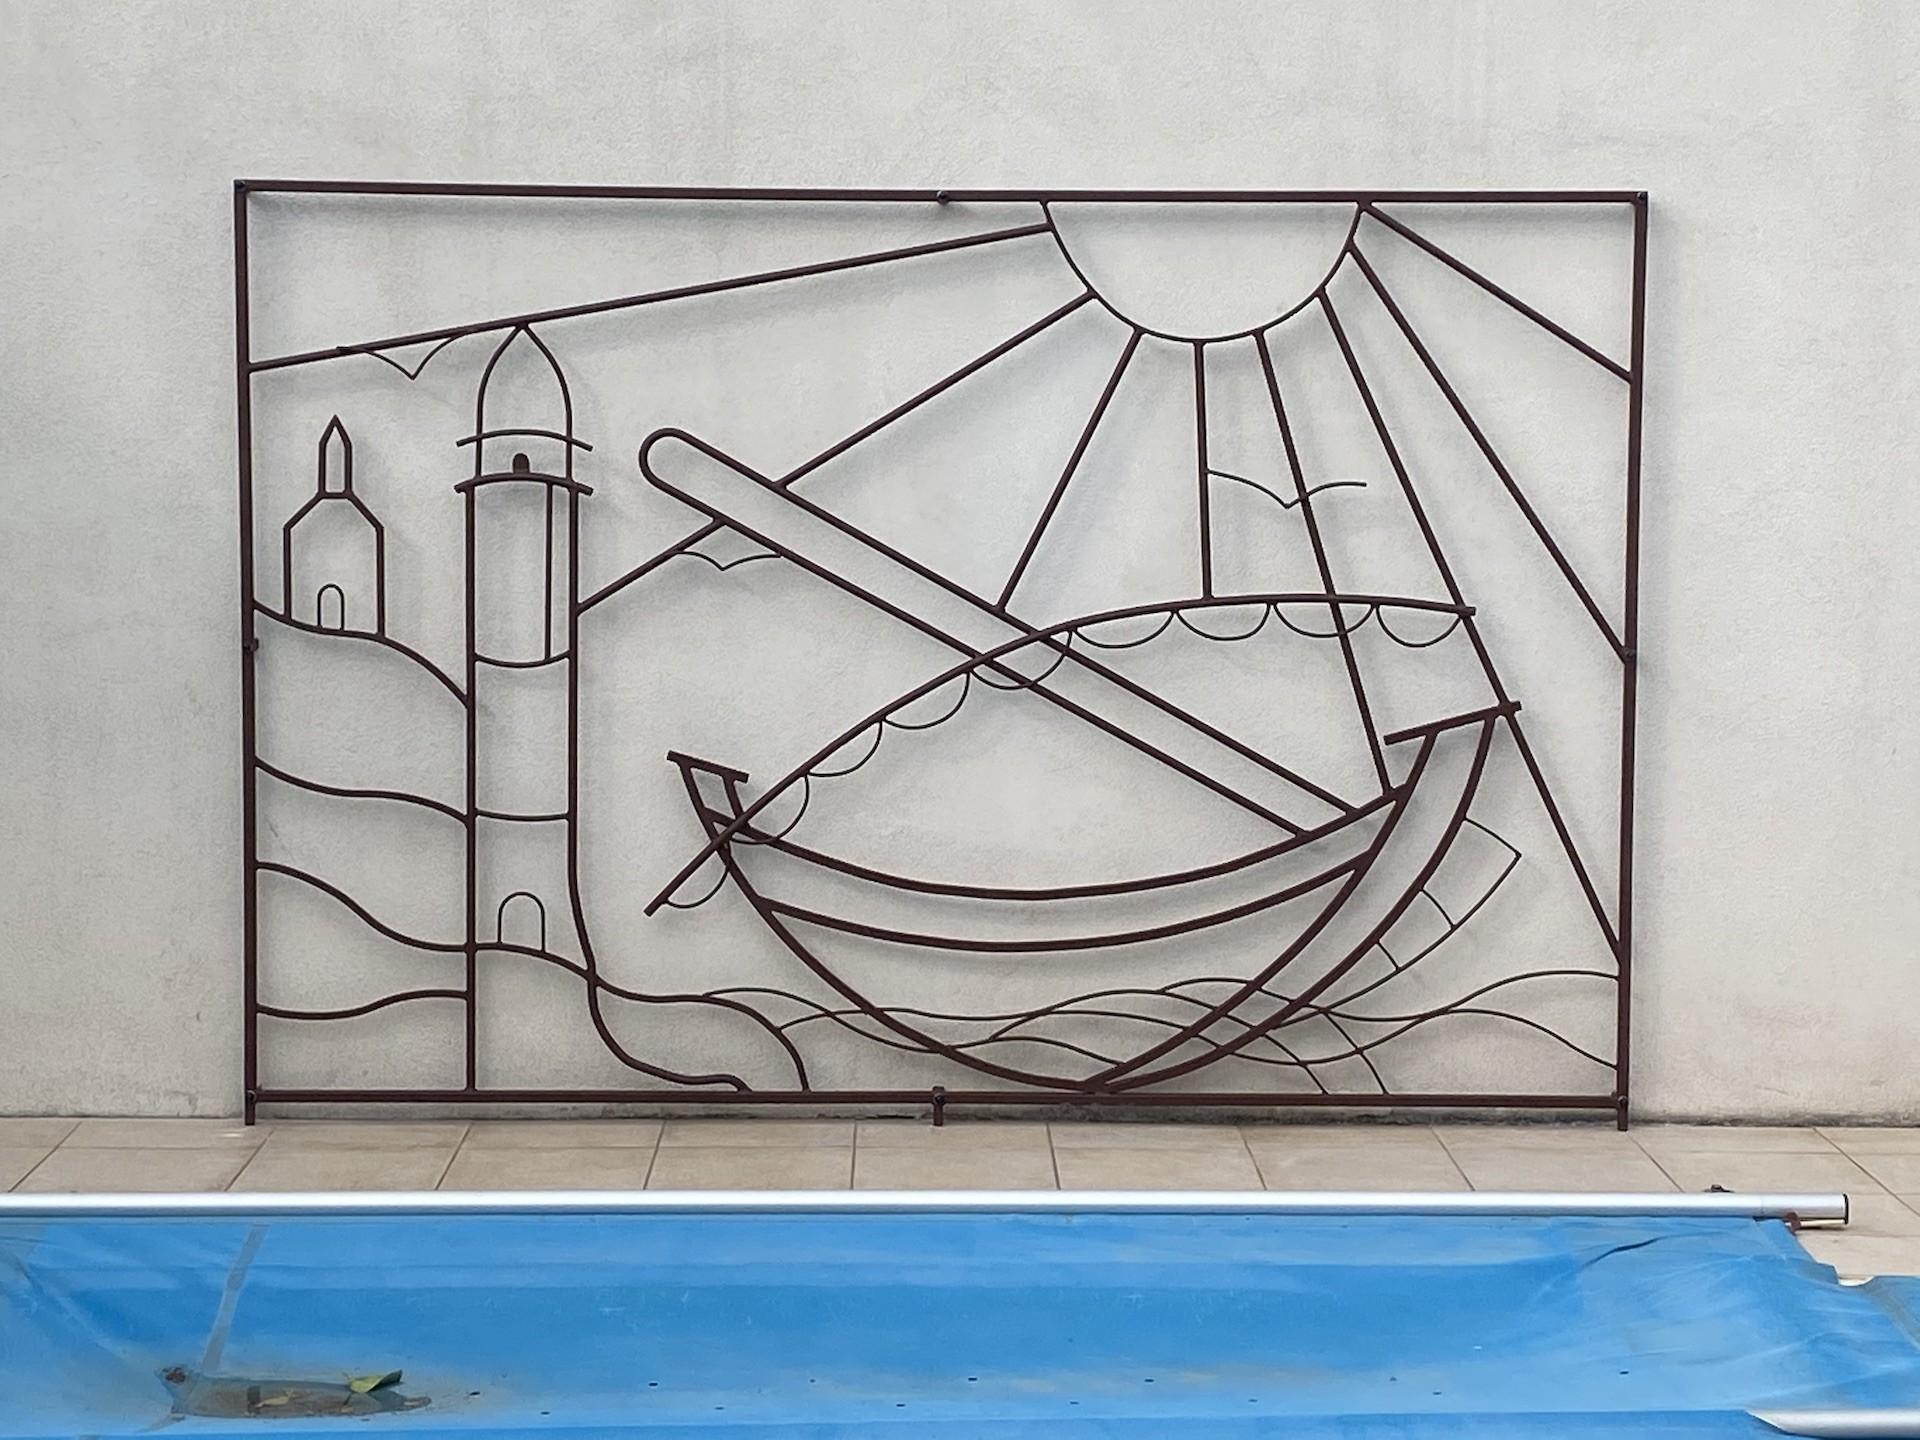 Tableau décoratif en relief